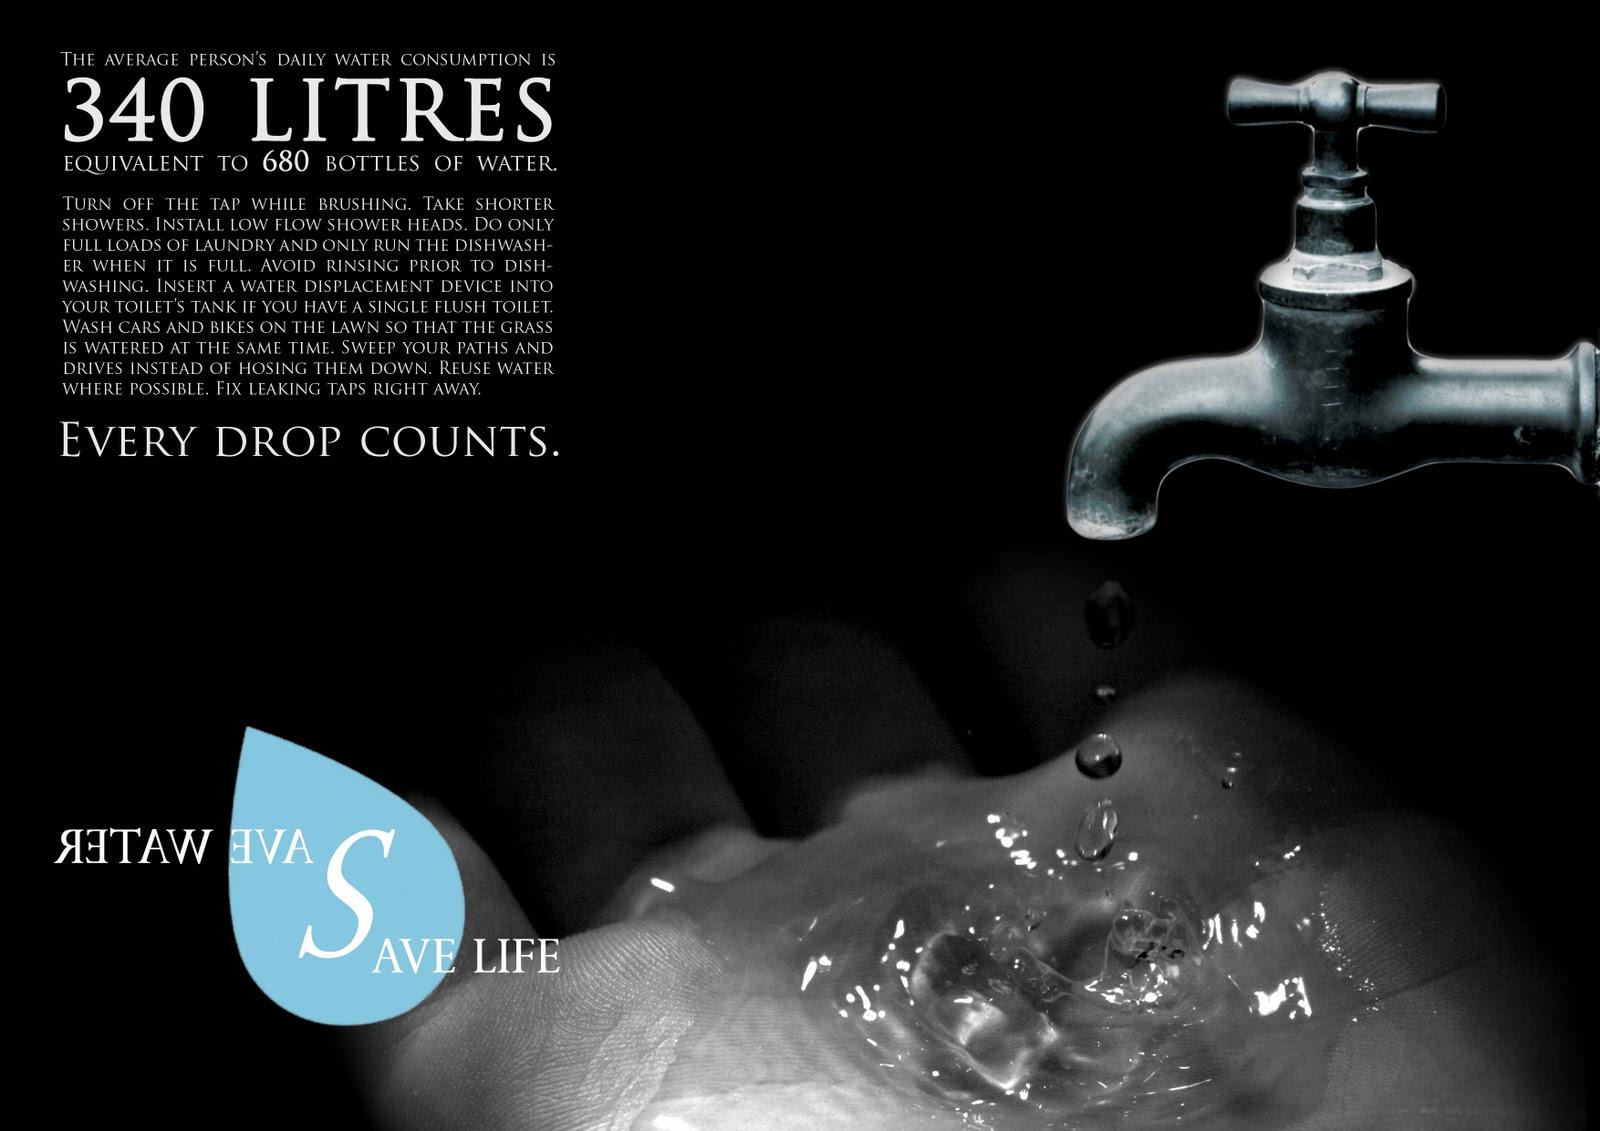 http://1.bp.blogspot.com/_f1K6vfx1PAc/TKucTj4qL0I/AAAAAAAAAFQ/O0toNT_gqLo/s1600/Save_Water_Poster_by_shaiful12.jpg